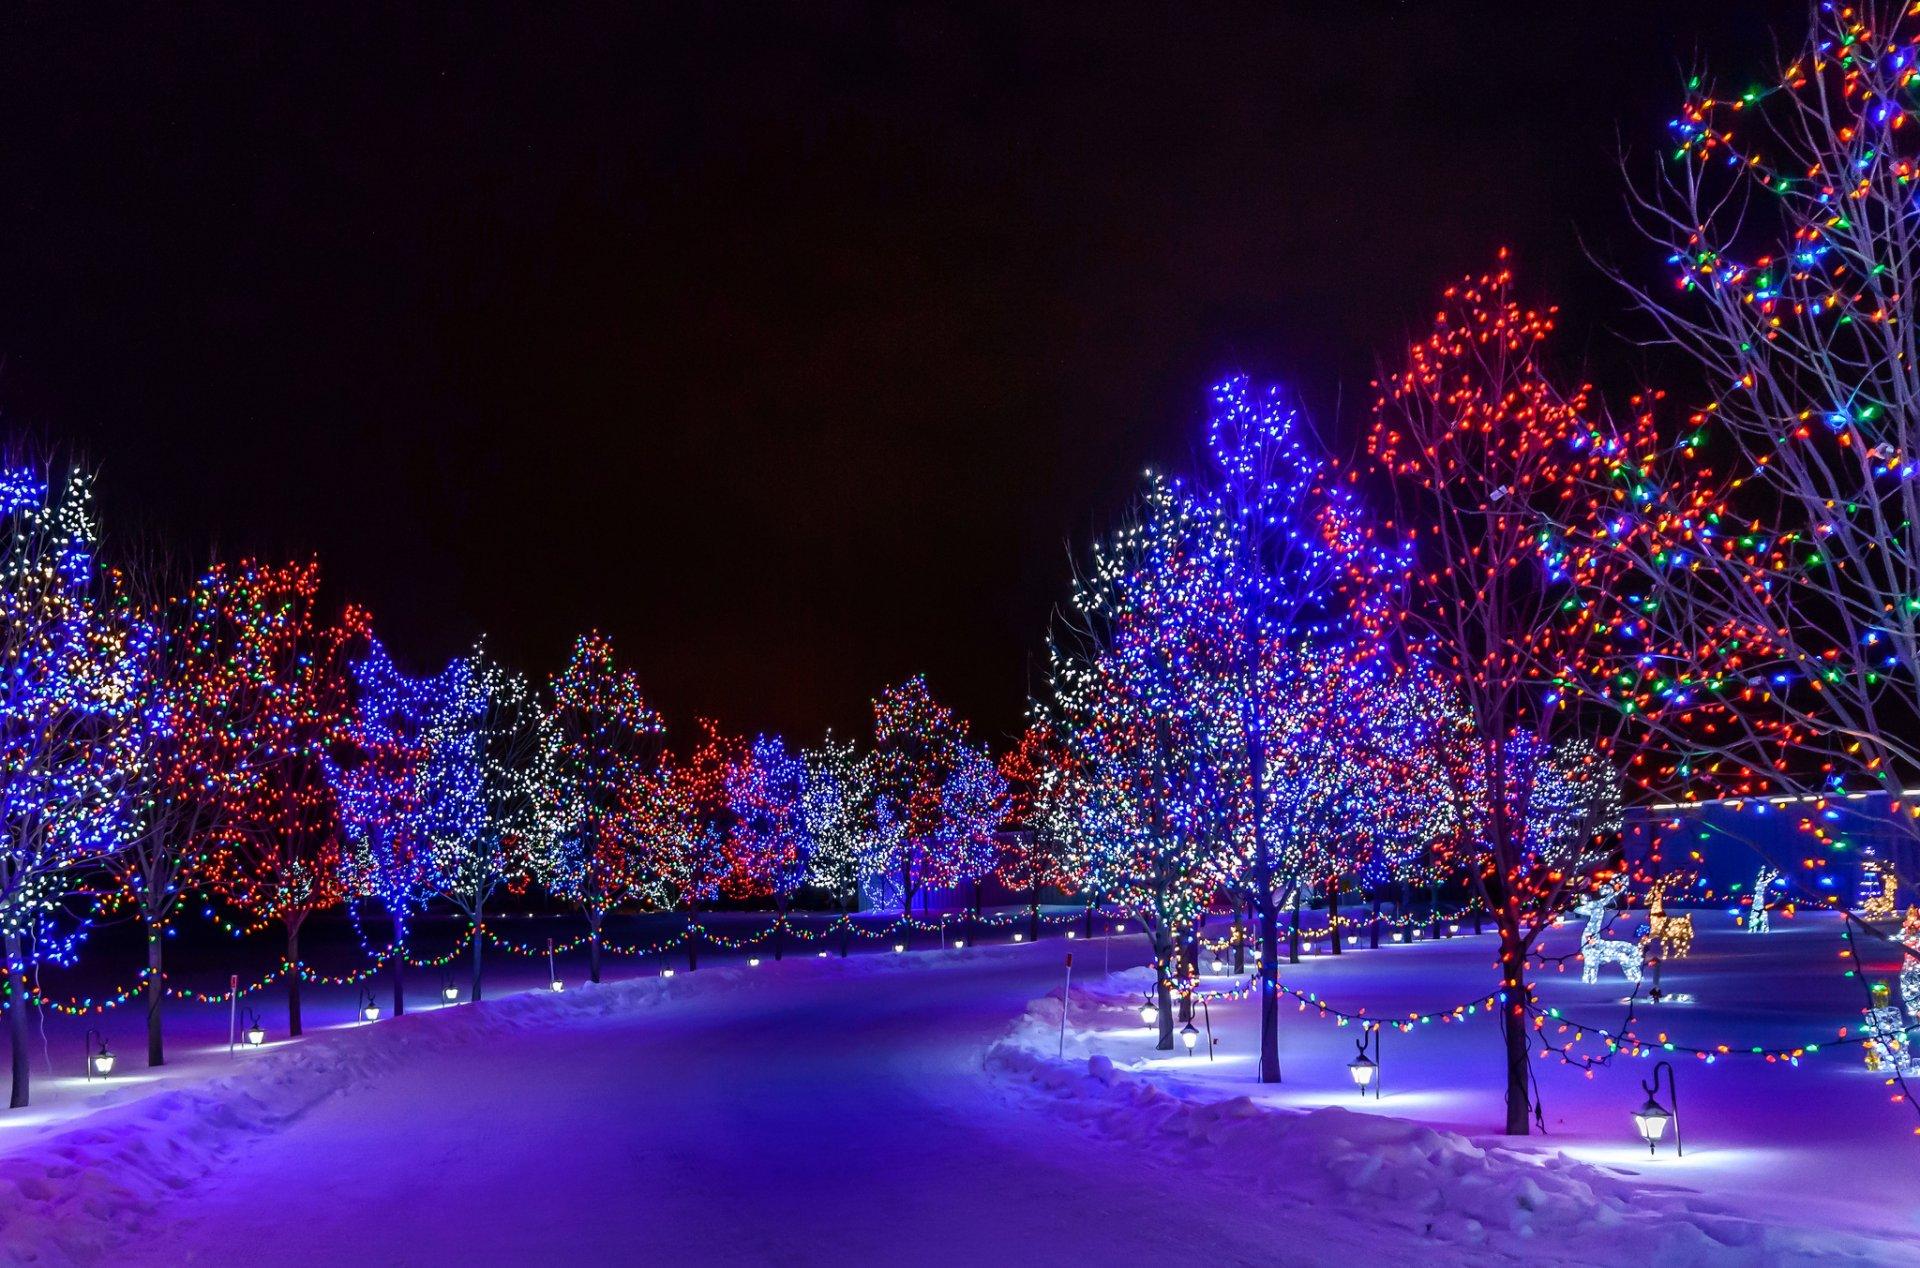 Картинки с новым годом зима и снег